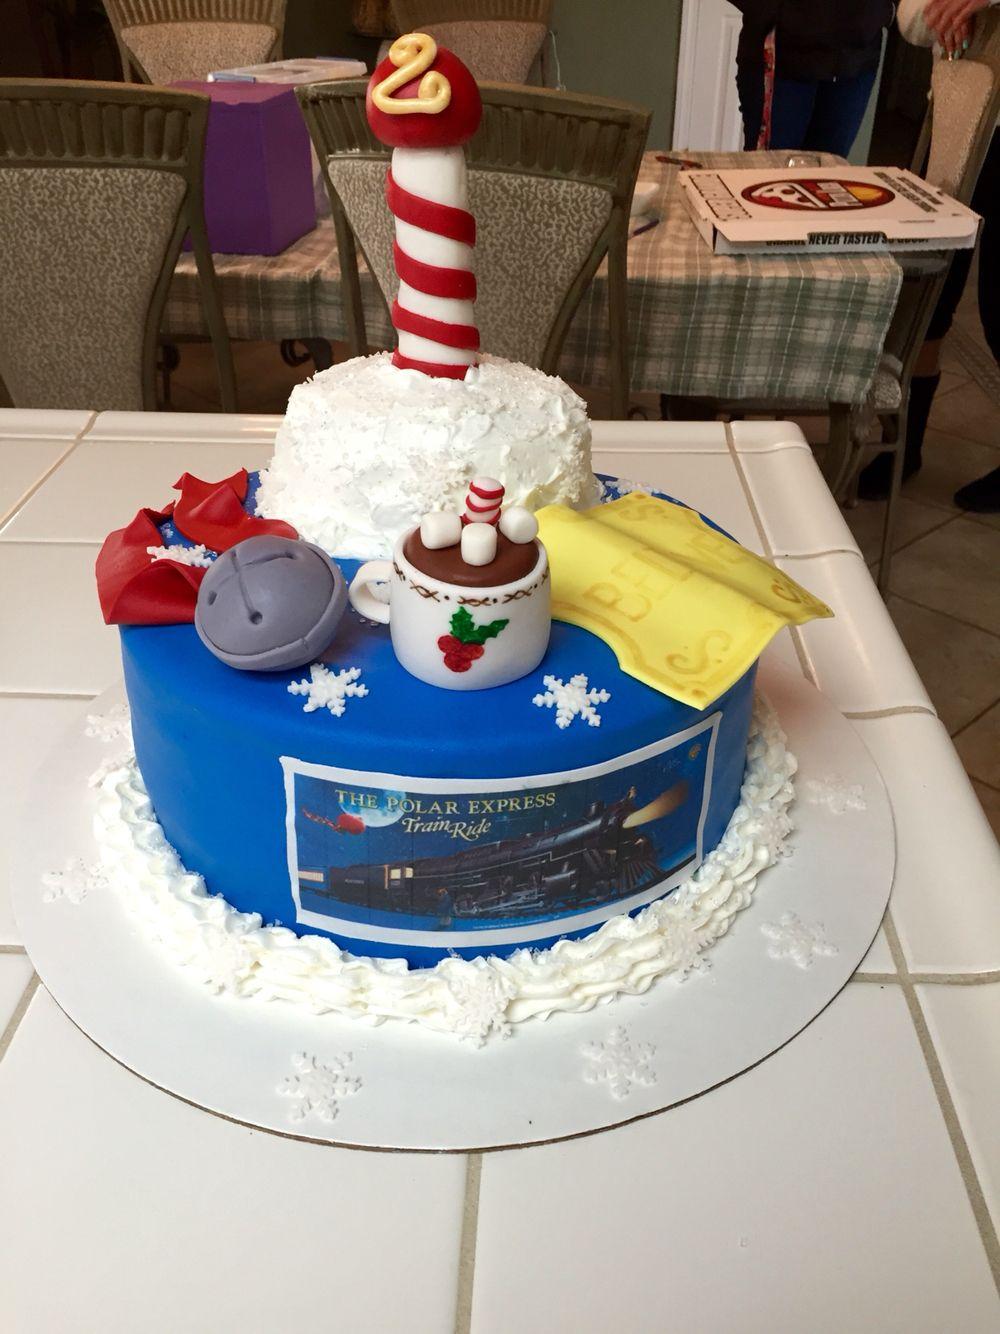 Magnificent Polar Express Cake Polar Express Birthday Cake Polar Express Funny Birthday Cards Online Fluifree Goldxyz